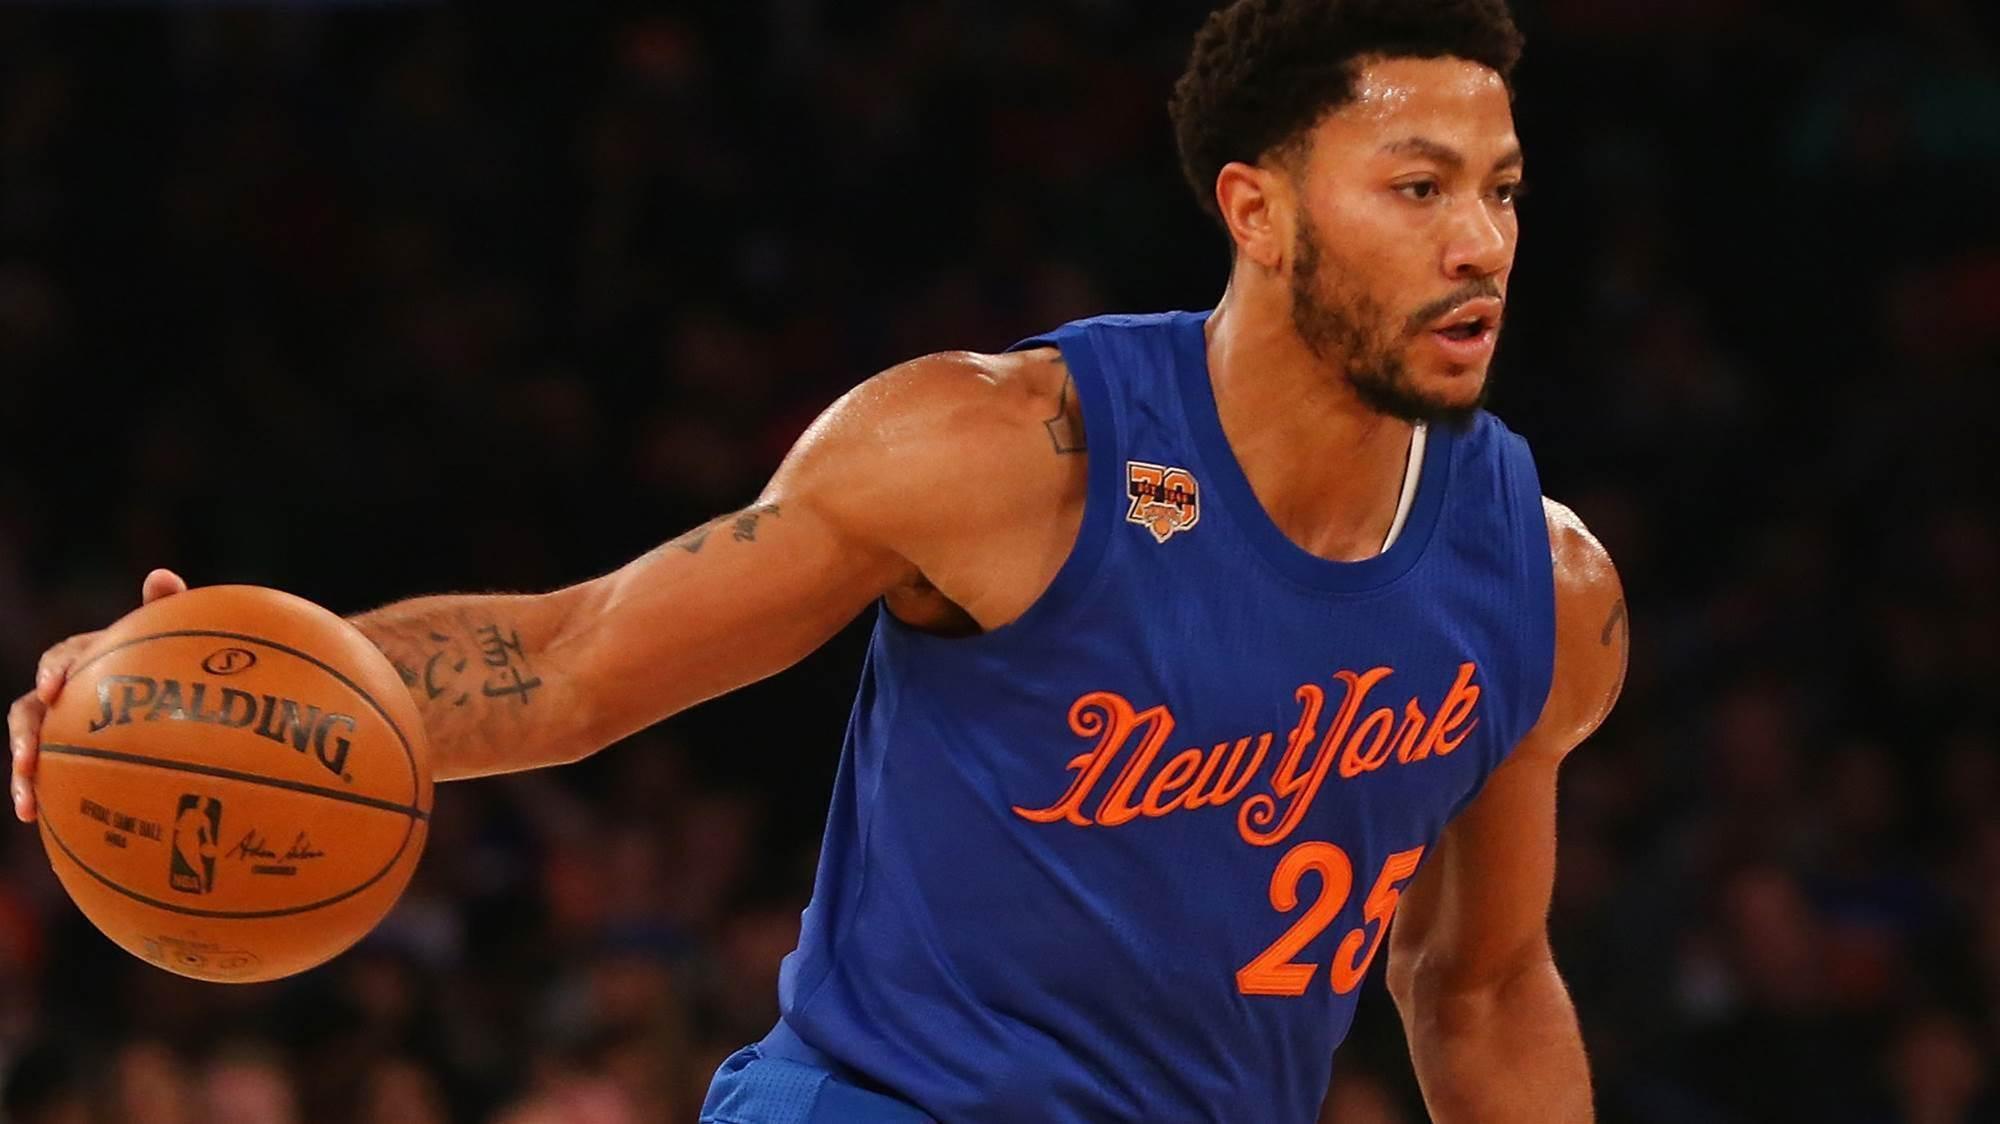 Missing NBA star explains himself